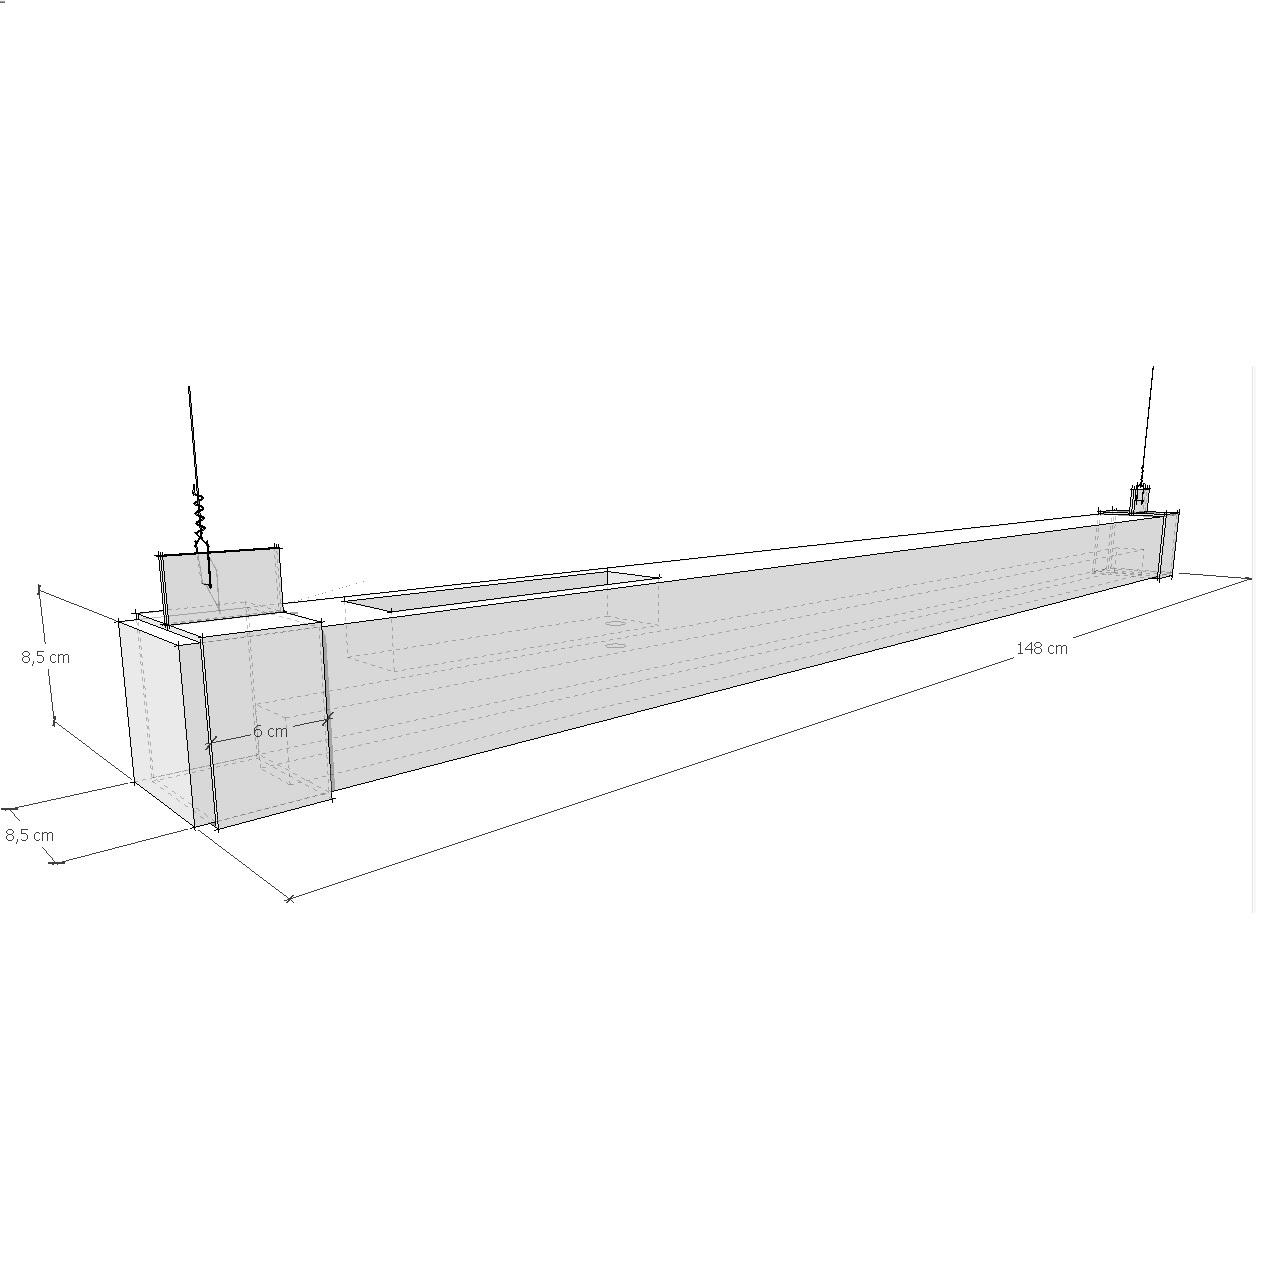 balklamp-woodlight-15-meter-indusigns-amsterdam